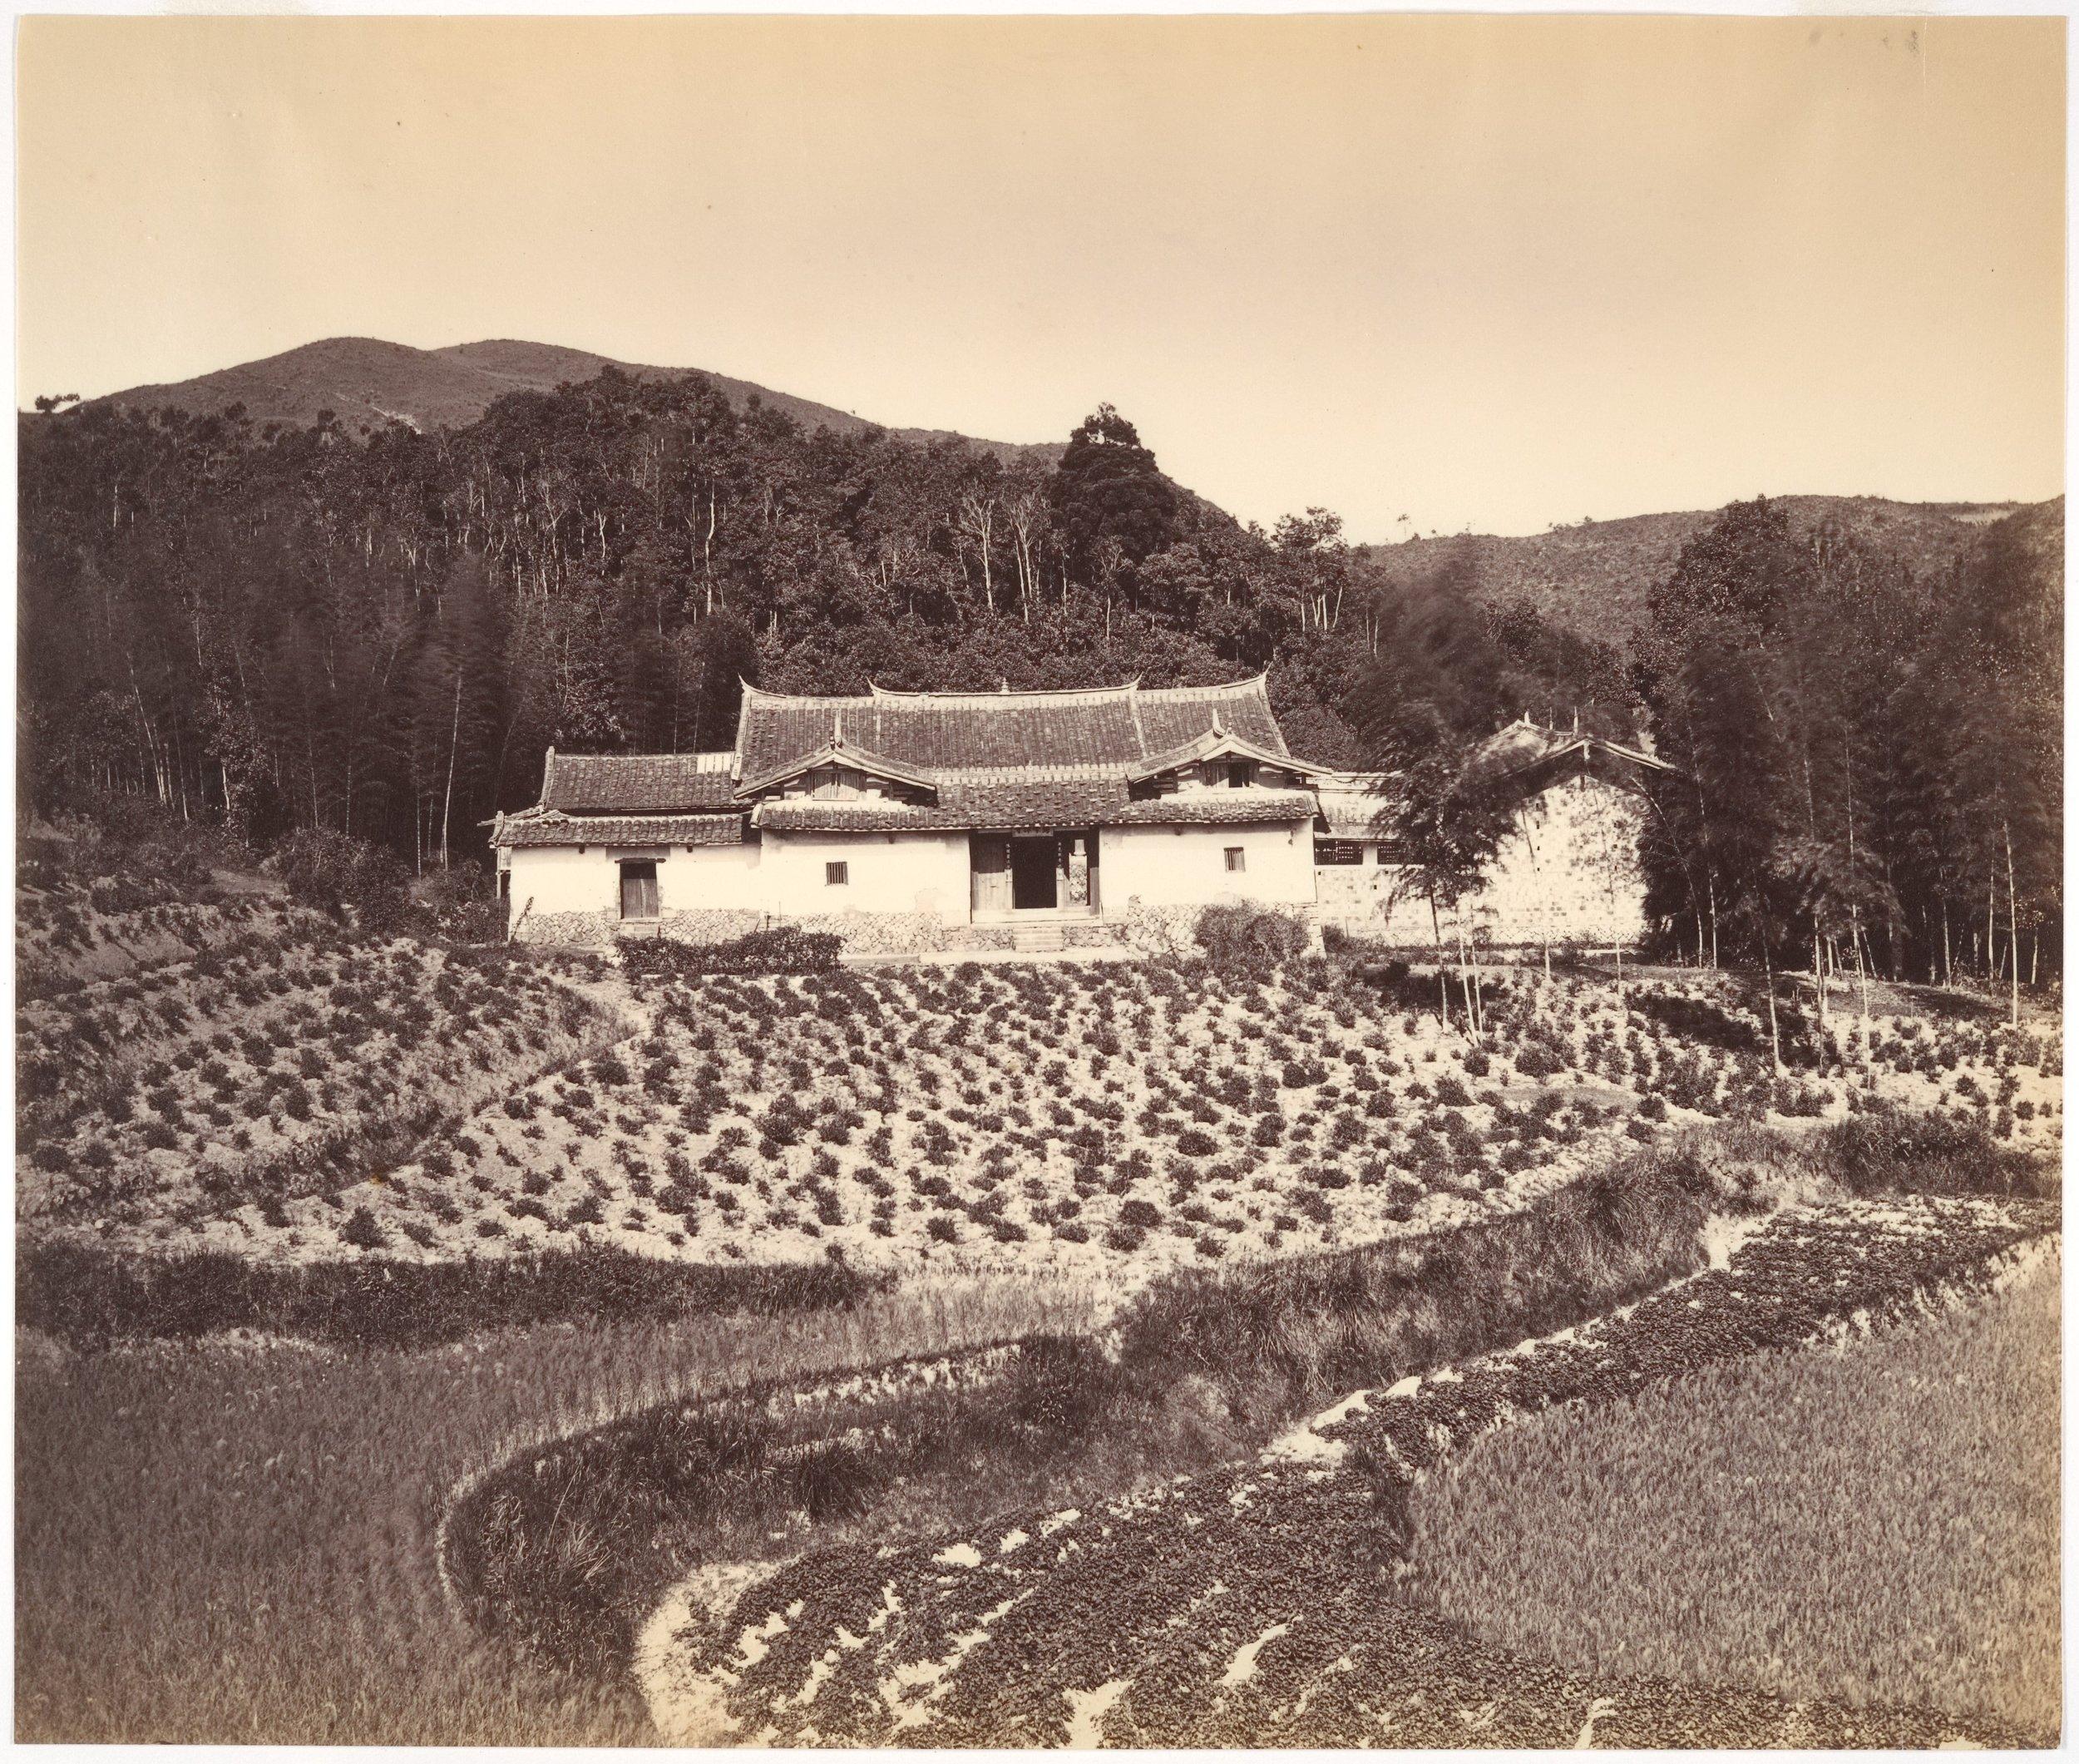 Woo-She-Shan, 1876, Albumen silver print from glass negative